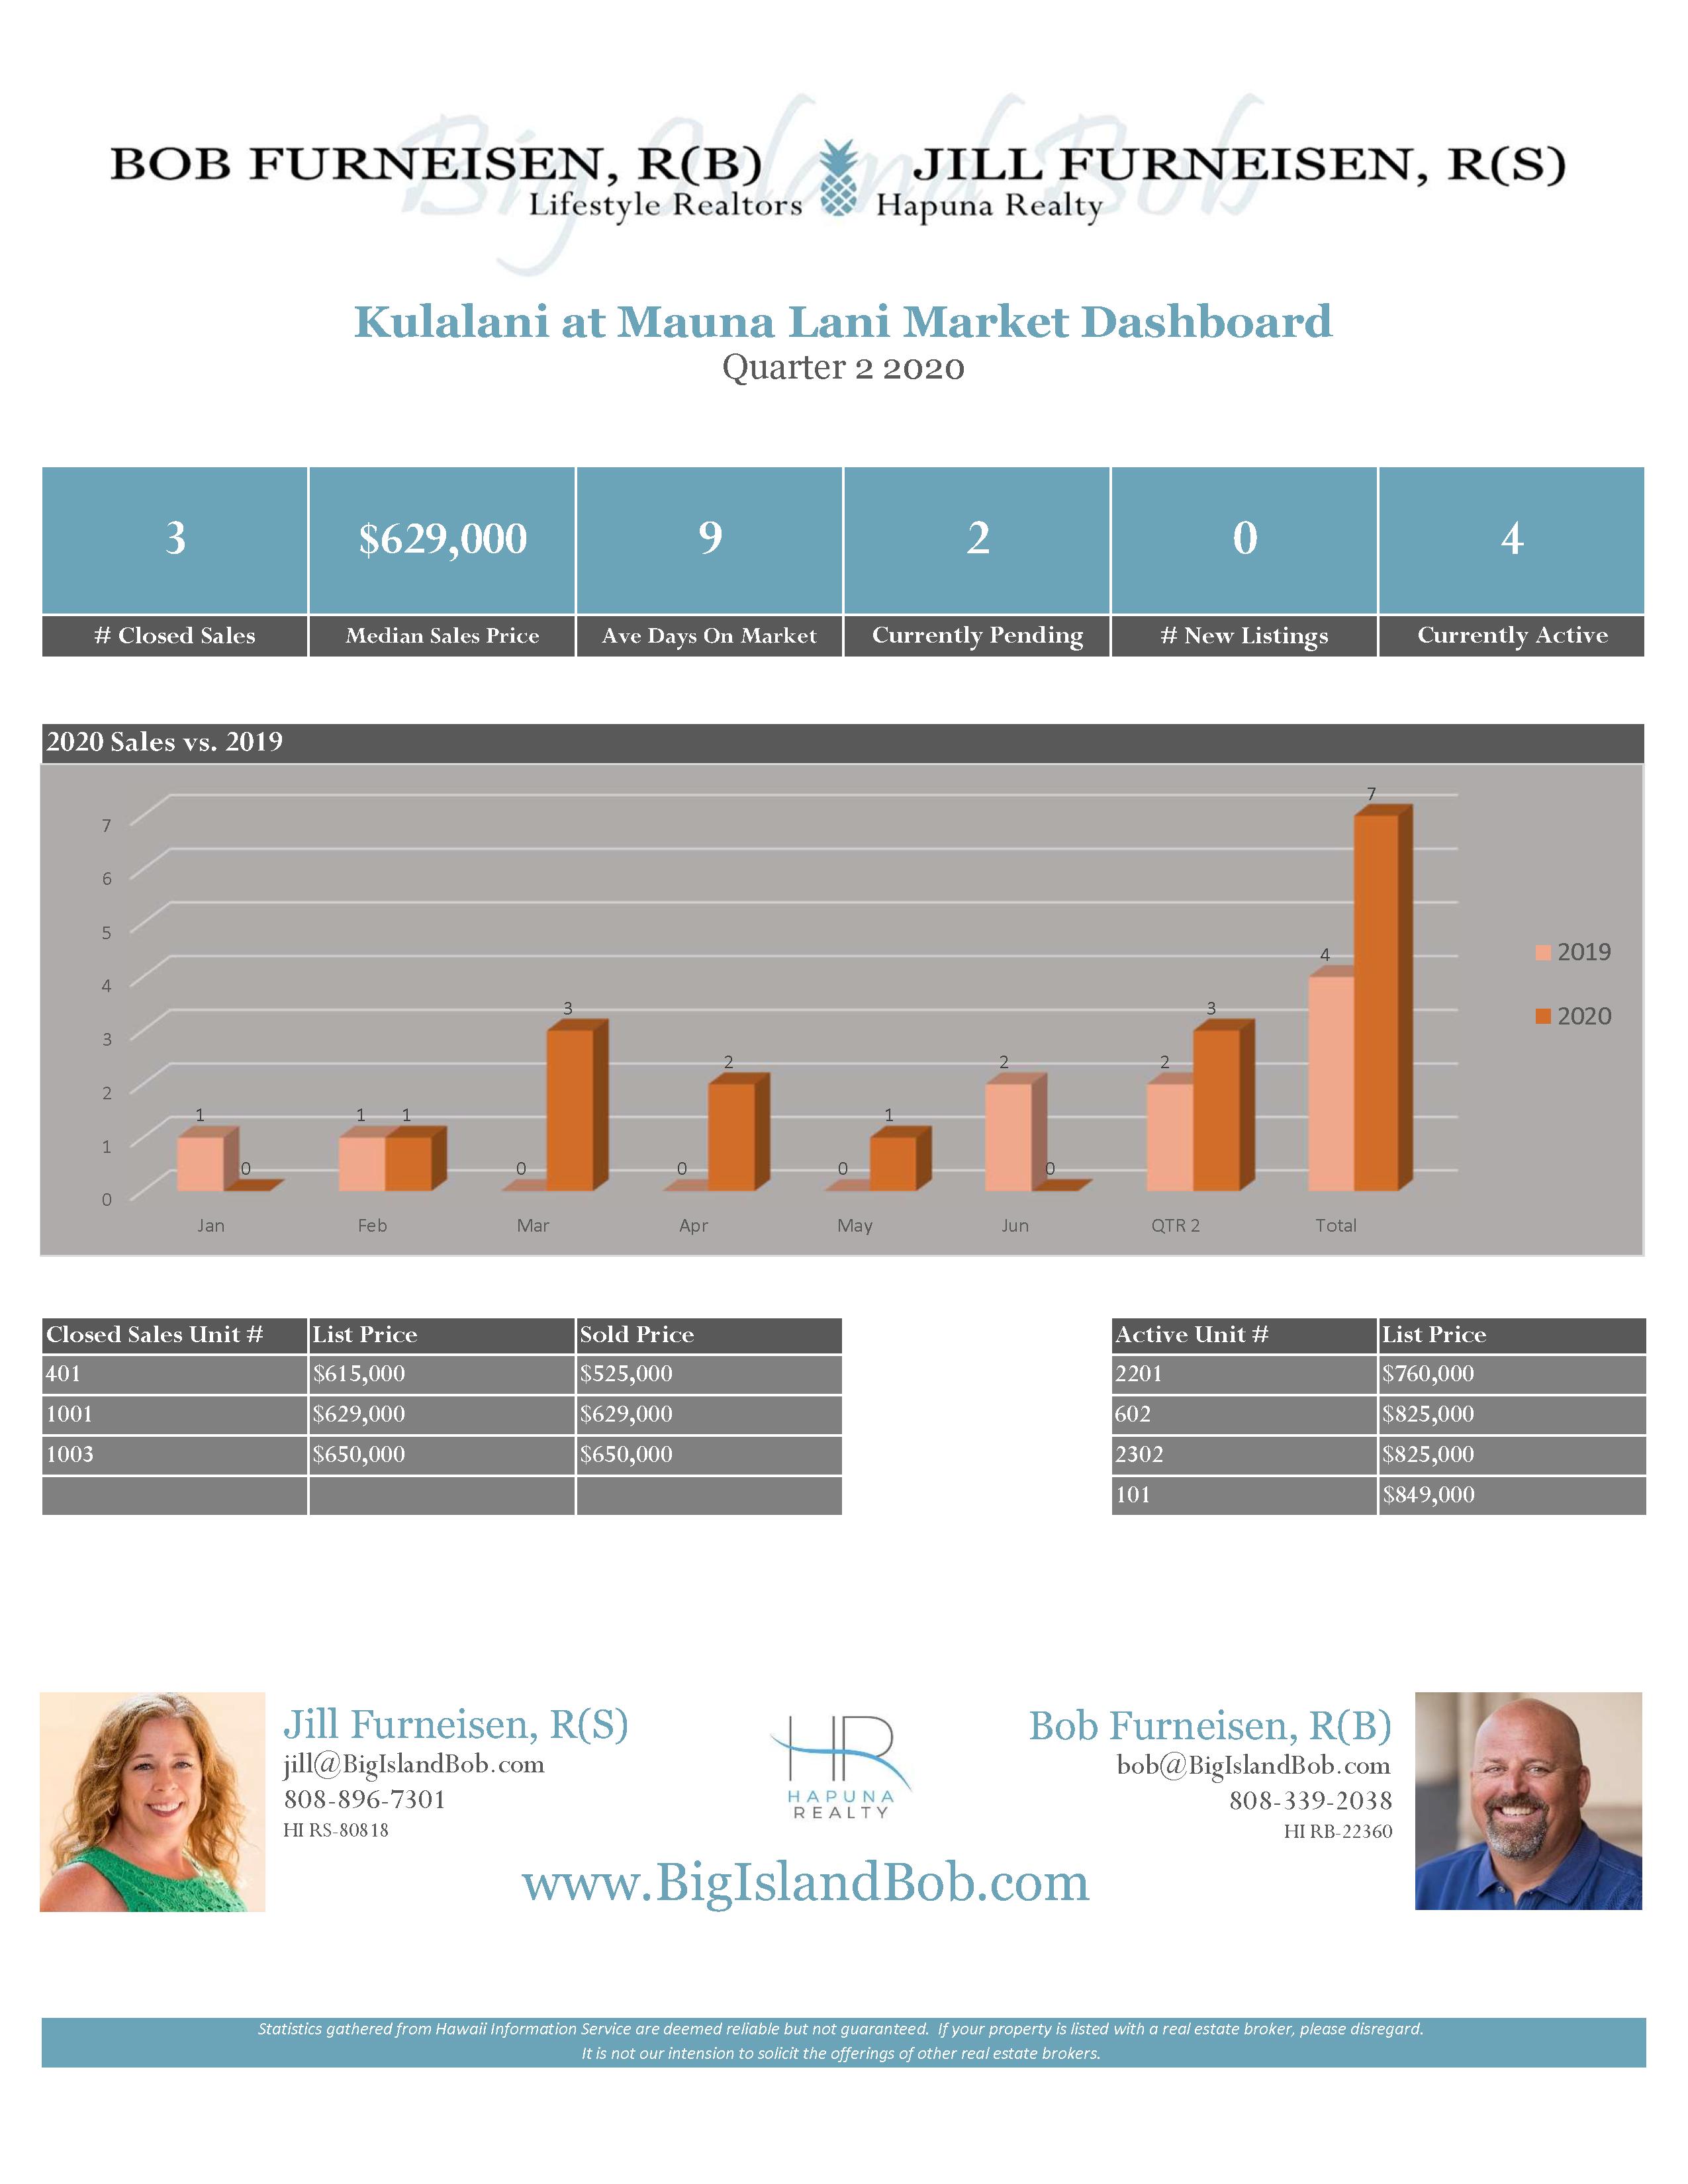 Kulalani at Mauna Lani Quarter 2 2020 Real Estate Market Dashboard